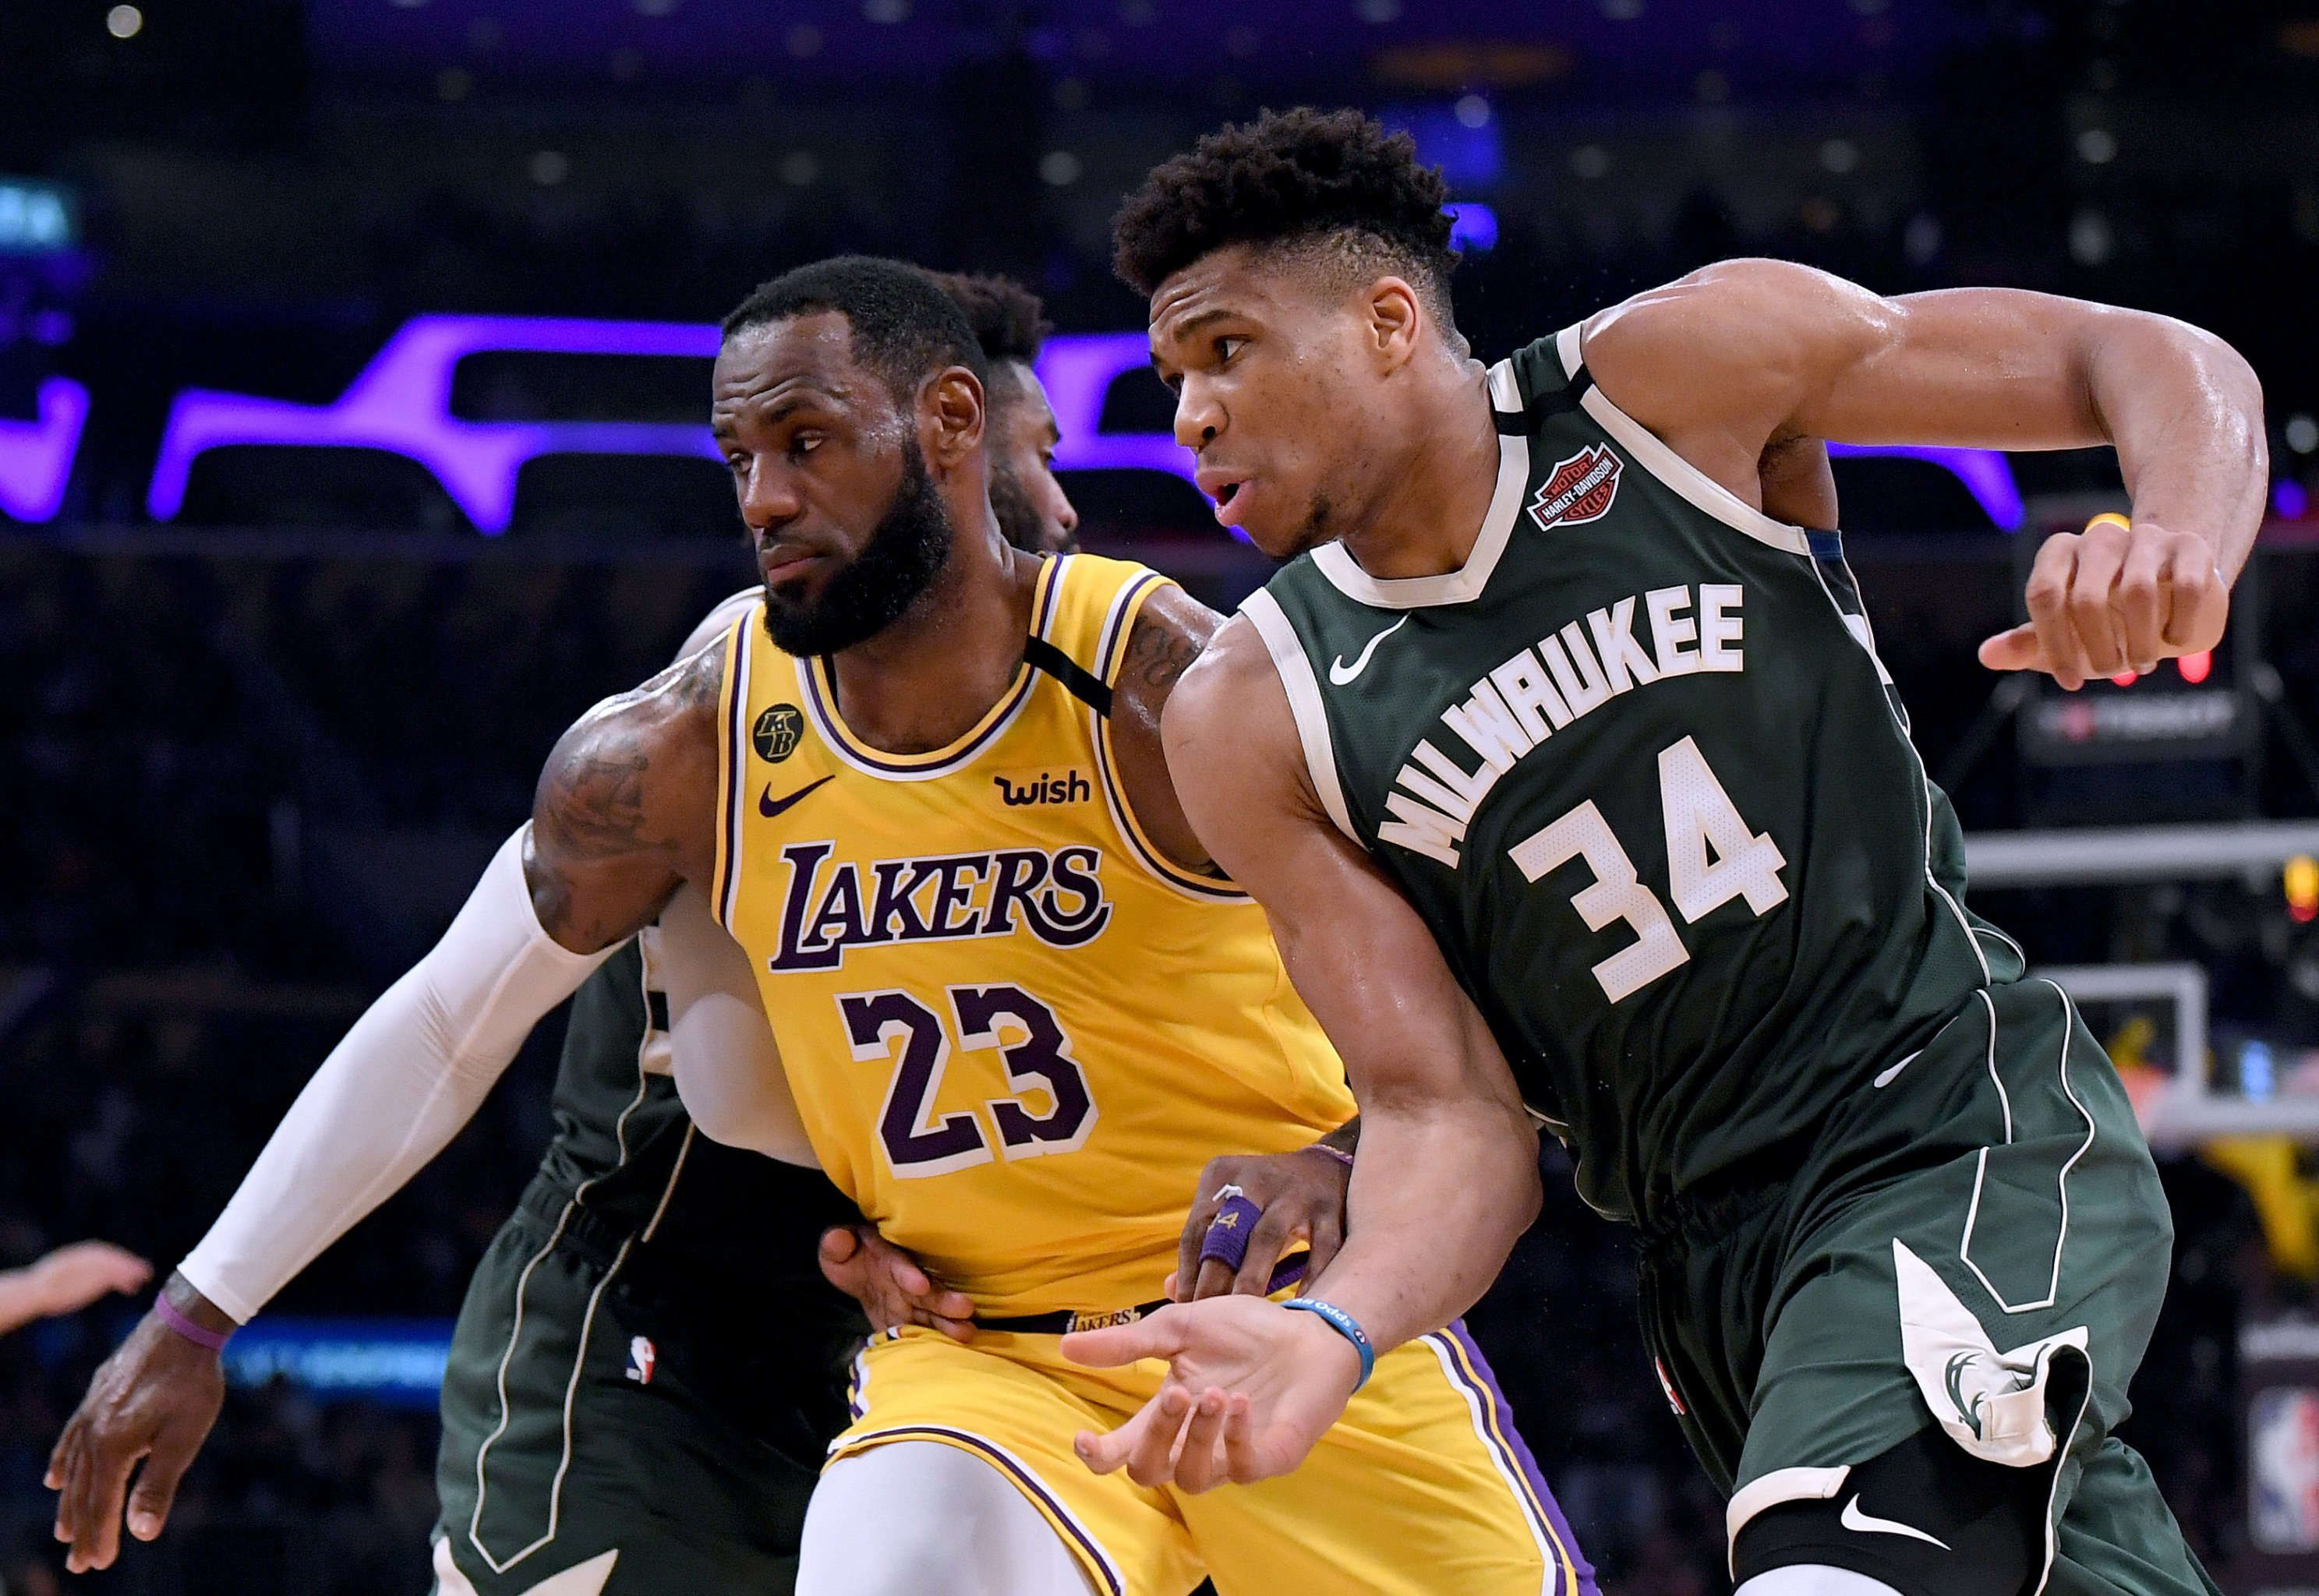 Bleacher Report's Top 100 Player Rankings from the 2019-20 NBA Season | Bleacher Report | Latest News, Videos and Highlights